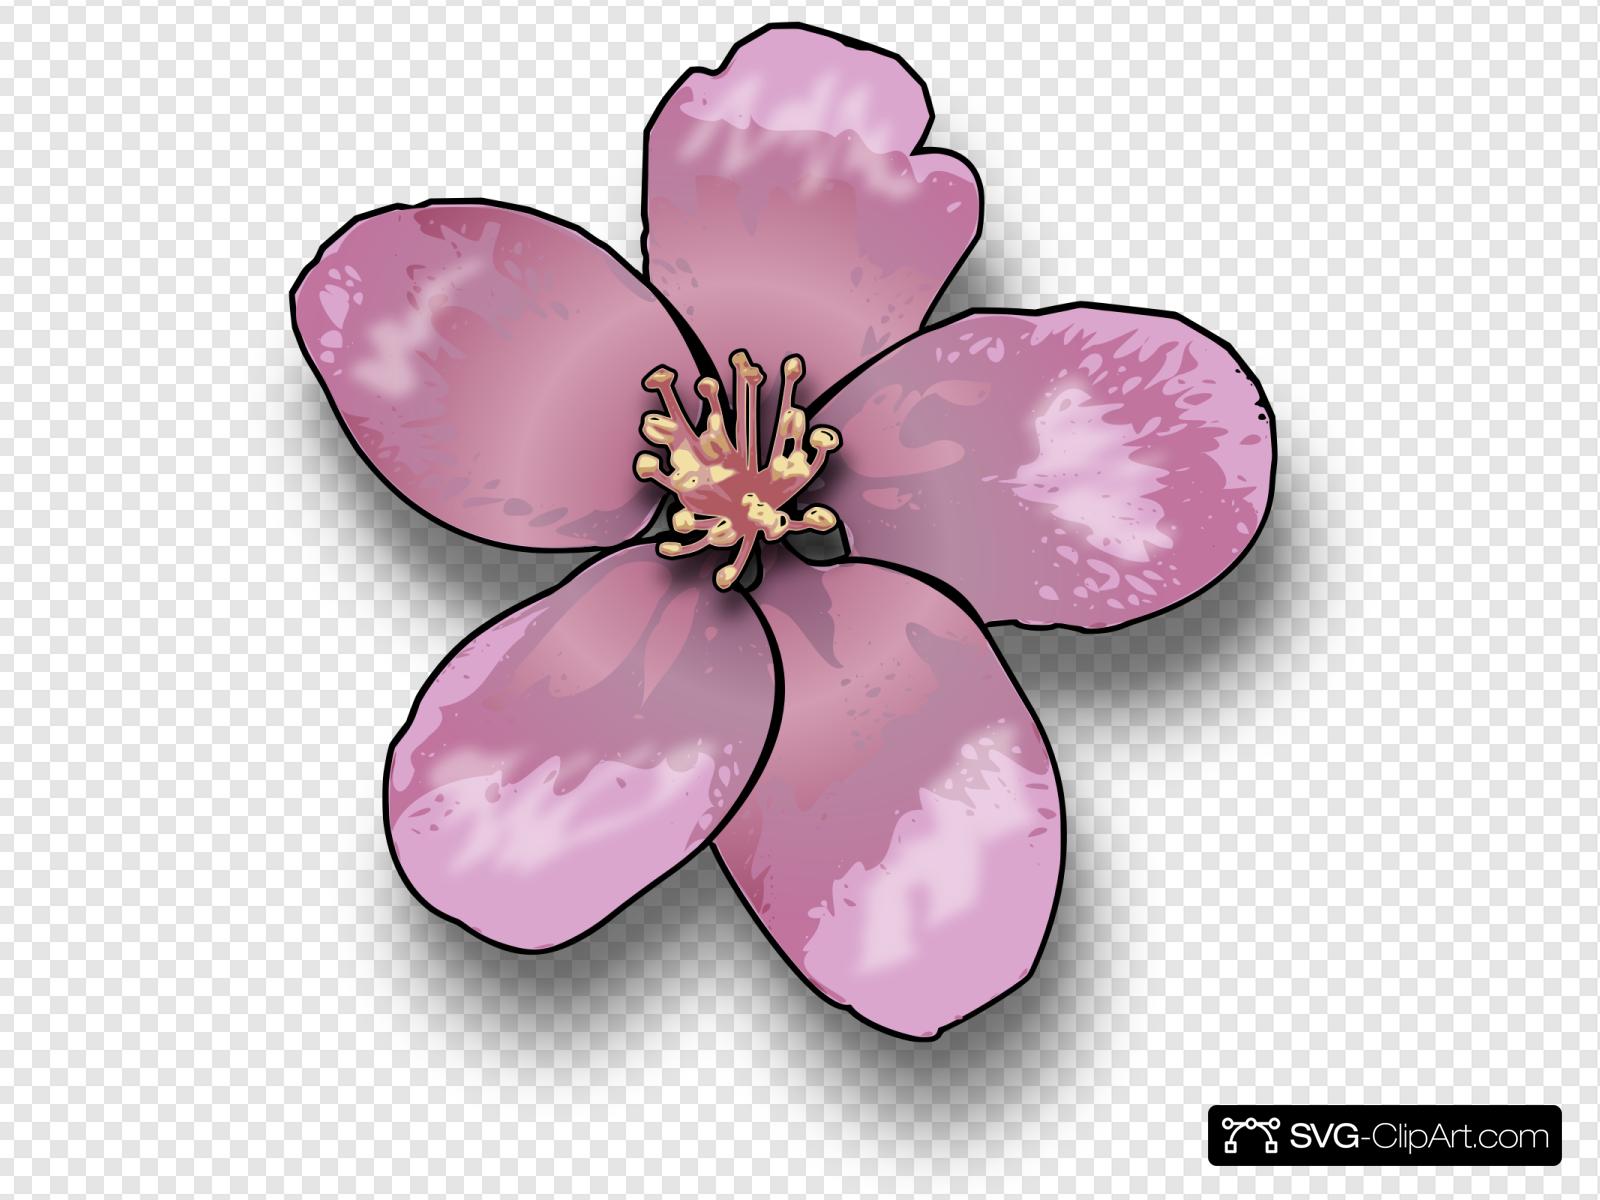 Apple Blossom Clip art, Icon and SVG.